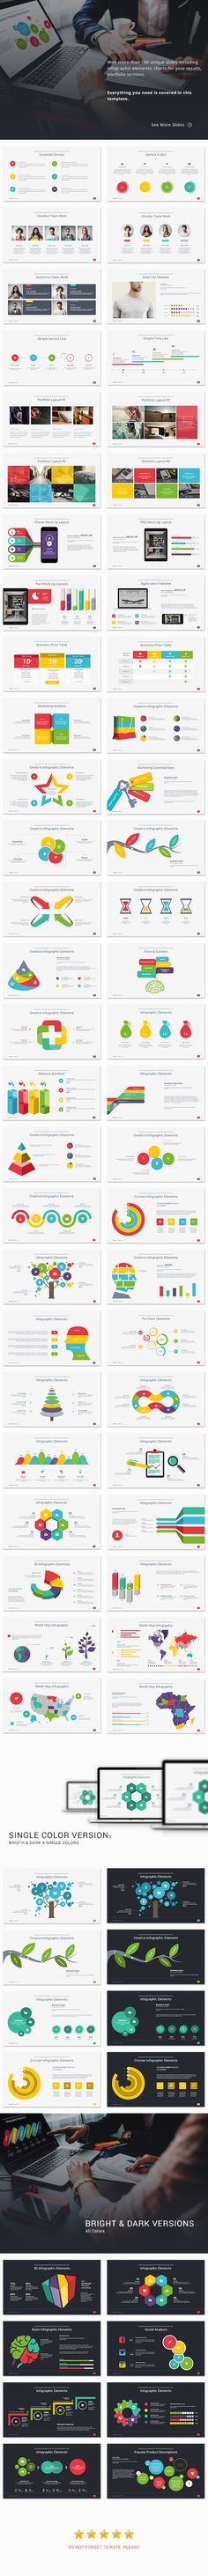 Amritha - Presentation PowerPoint Template #design #slides Download: http://graphicriver.net/item/amritha-presentation-template/11863779?ref=ksioks